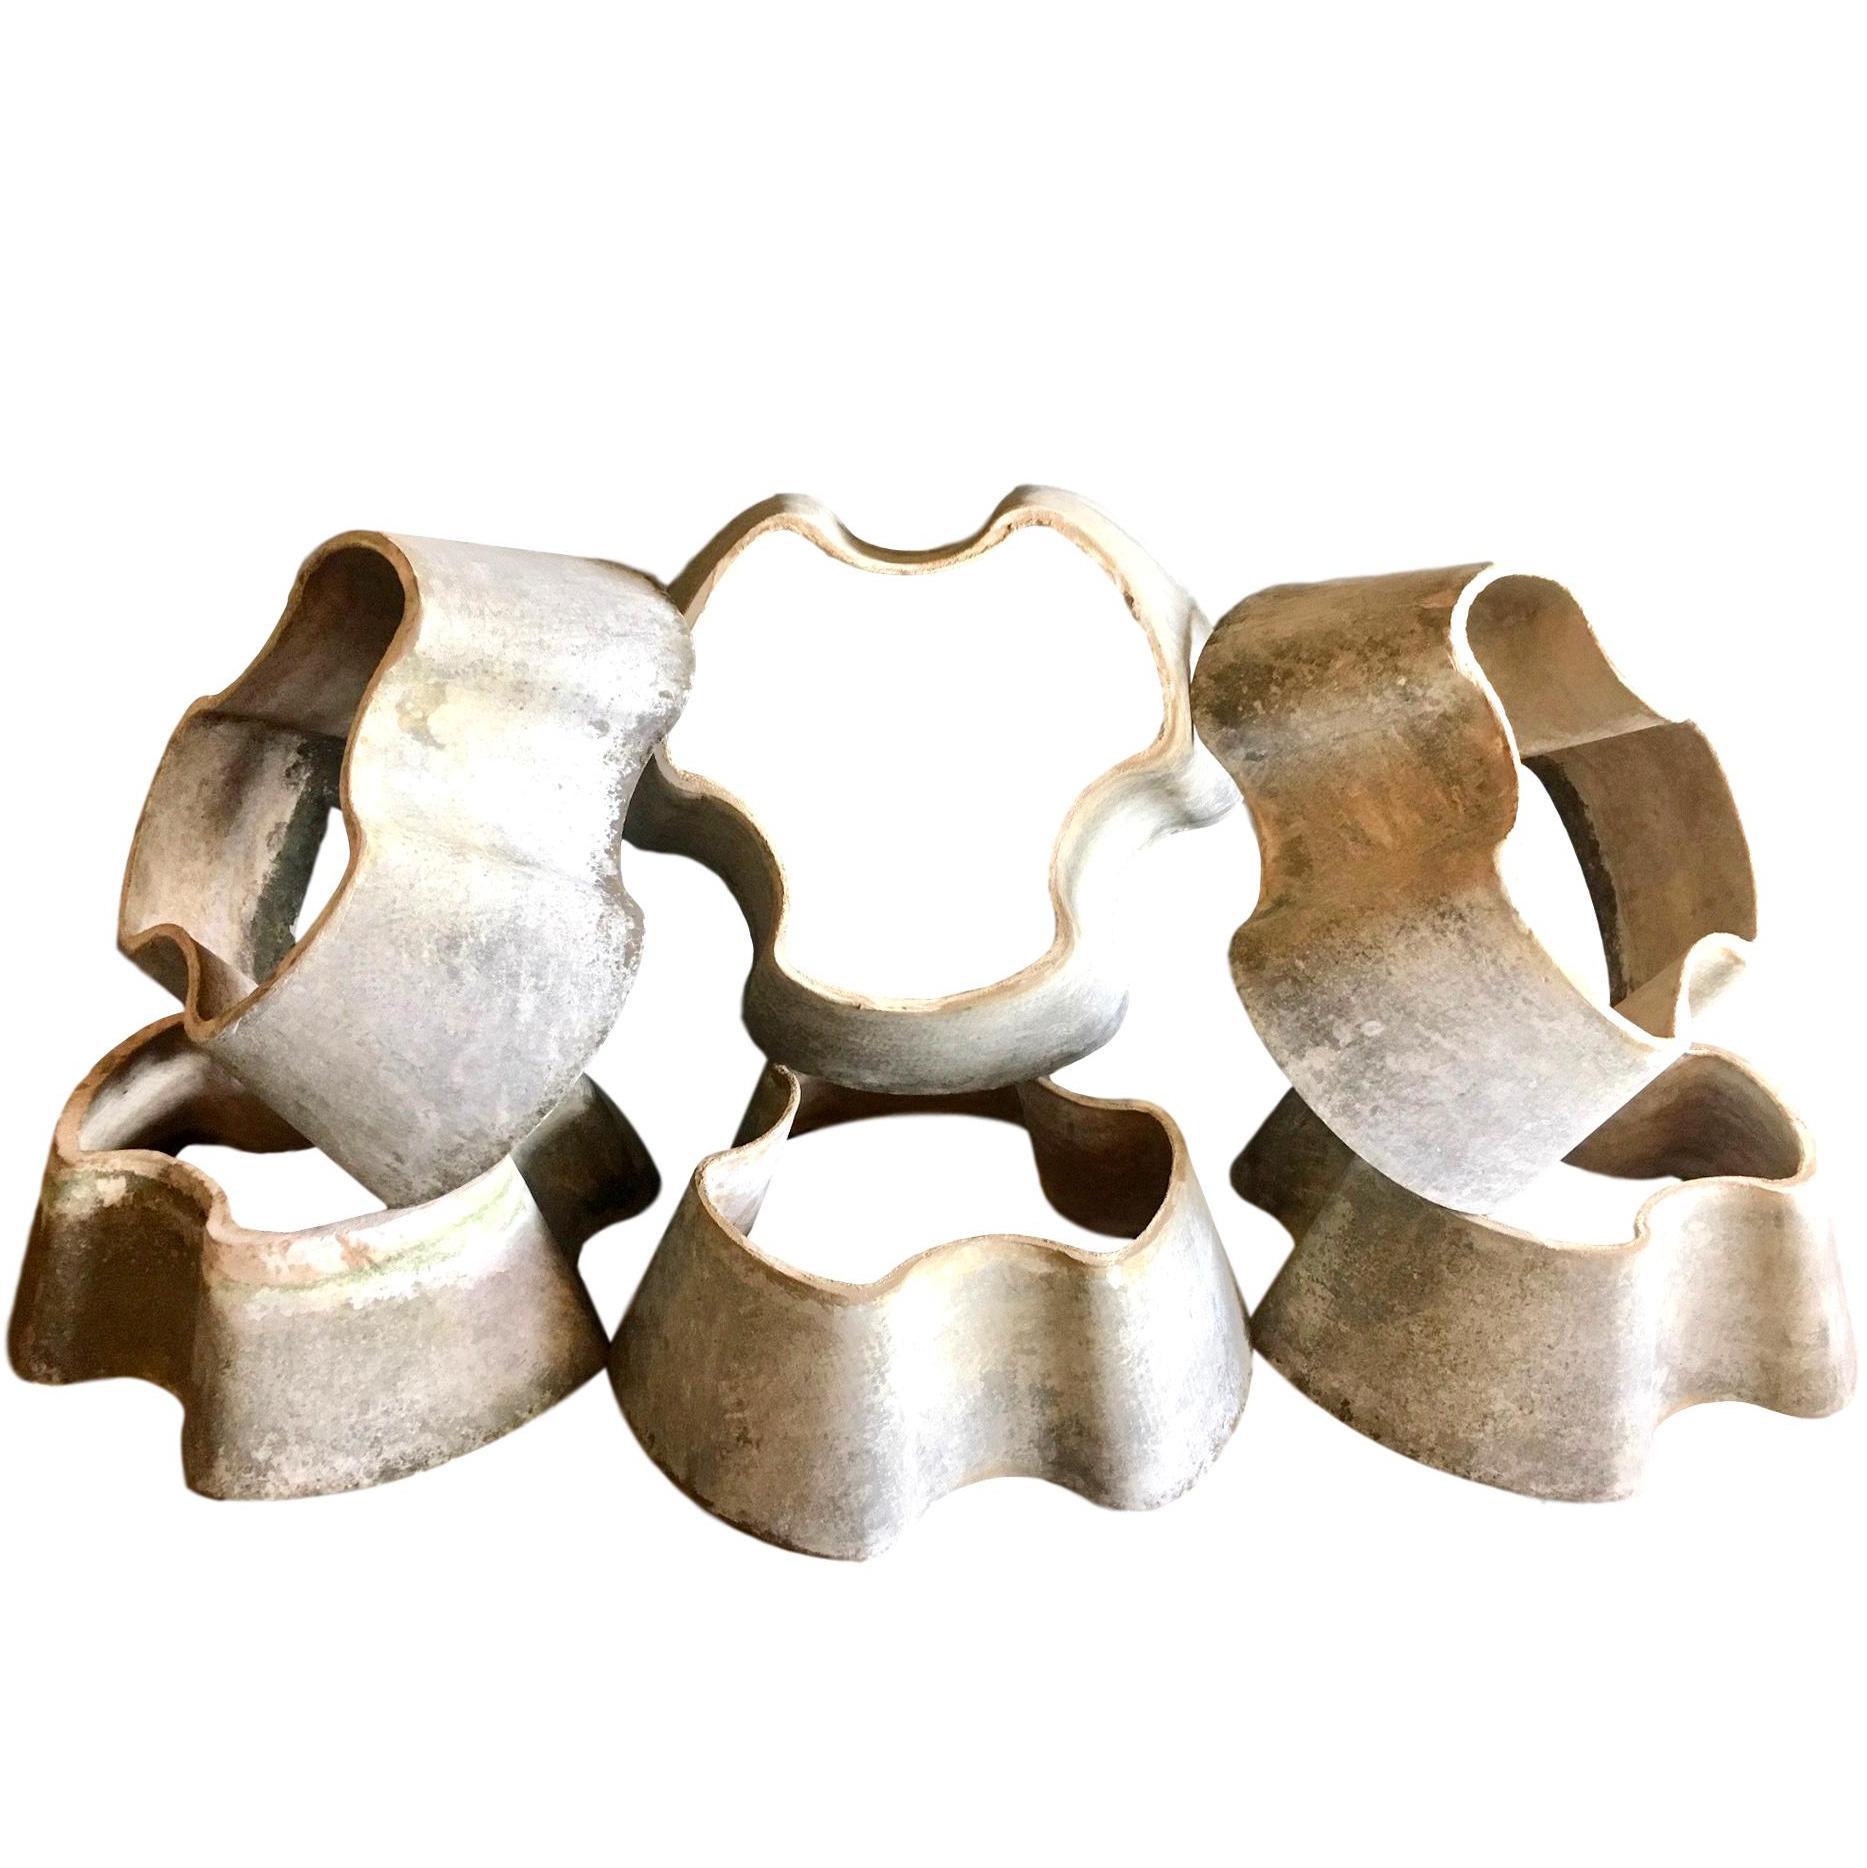 Set of 5 Willy Guhl Flower Pots